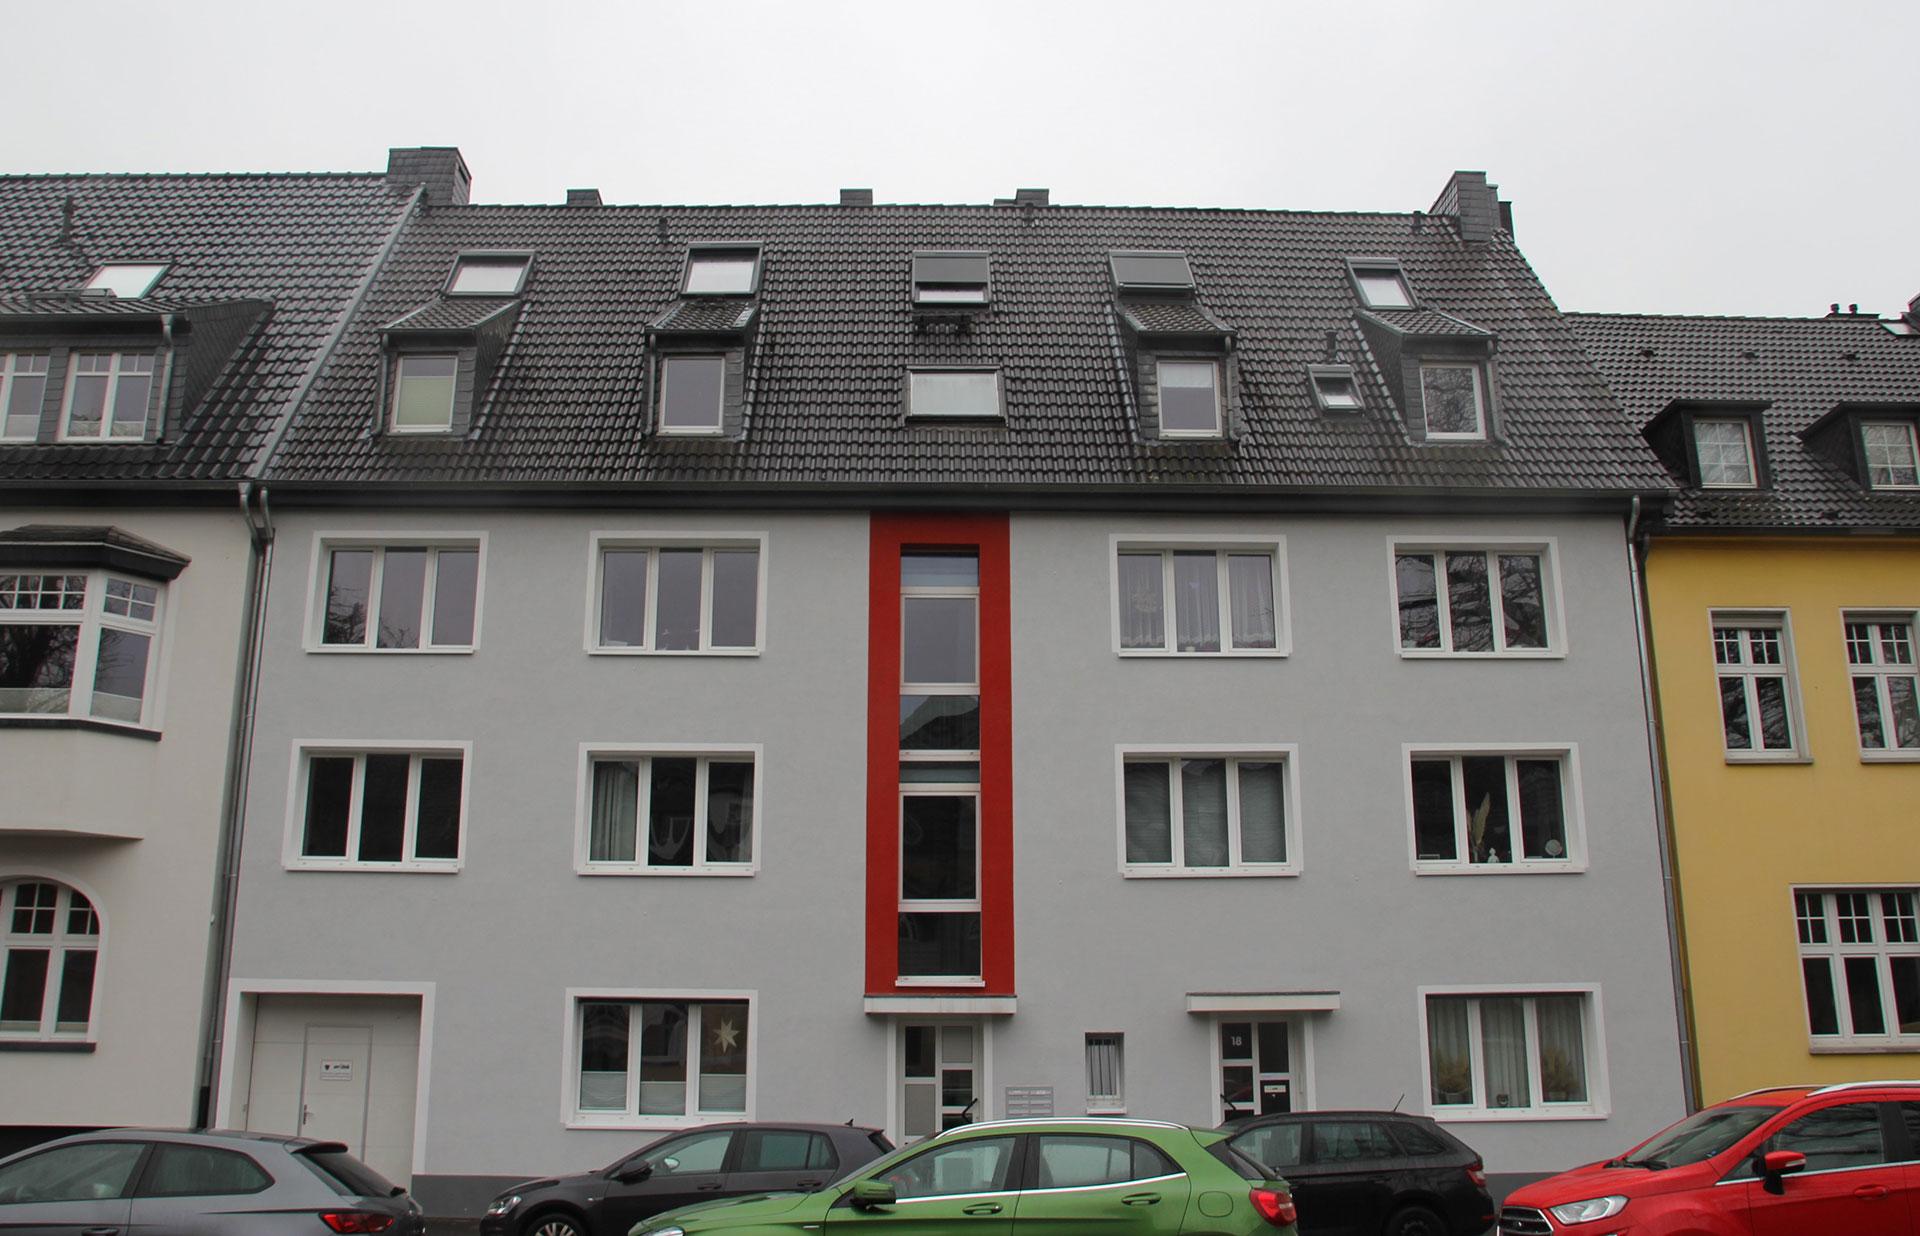 Hausverwaltung Krefeld: Hohenzollerstraße Mietverwalter